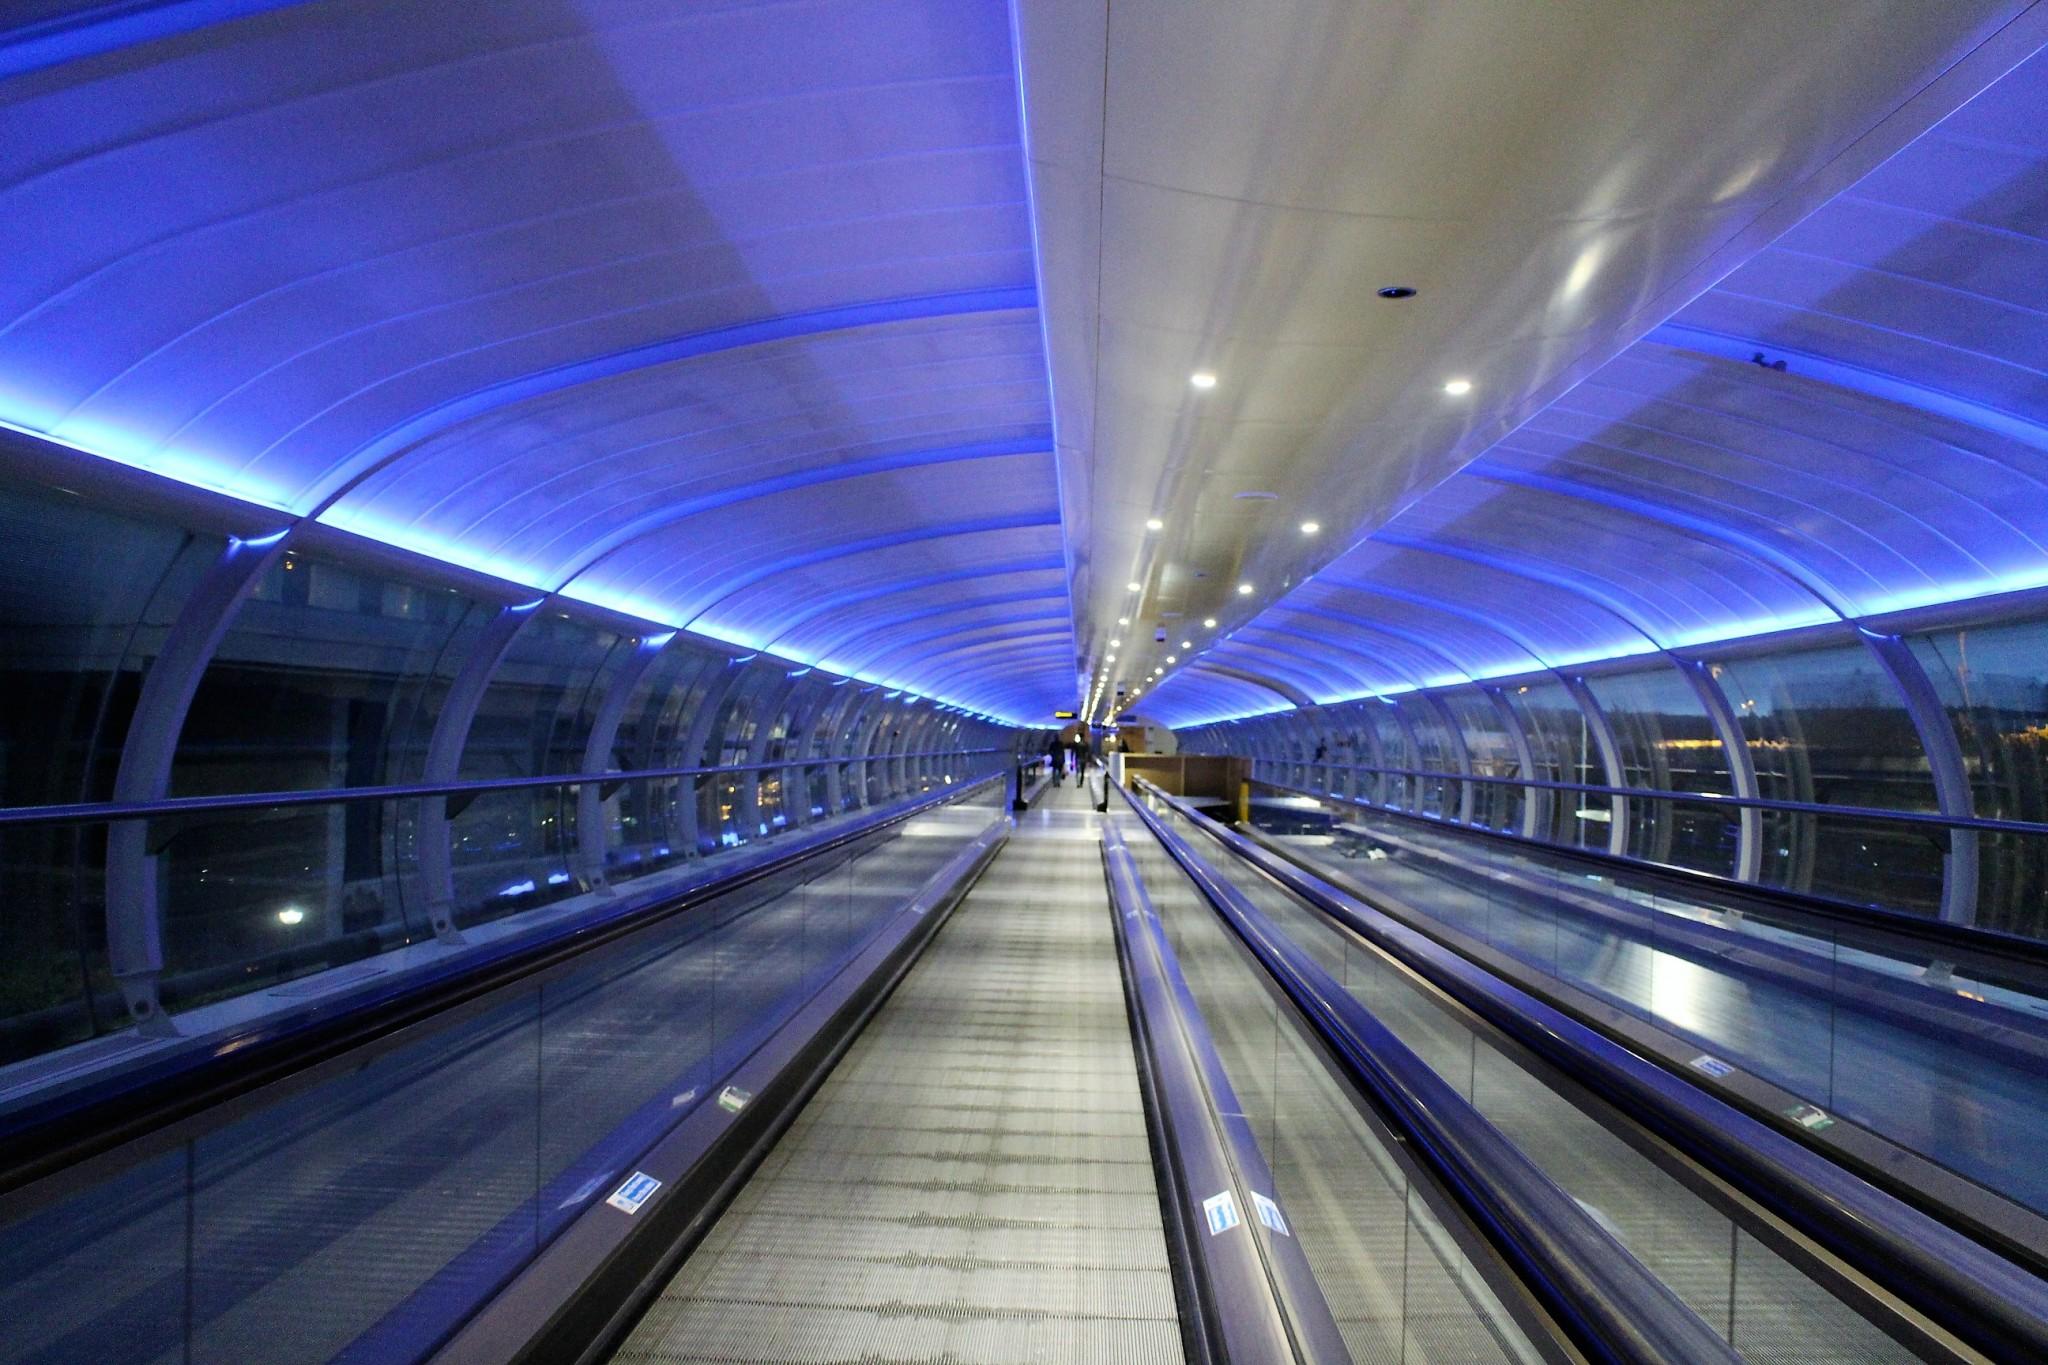 Radisson Blu Manchester Airport location